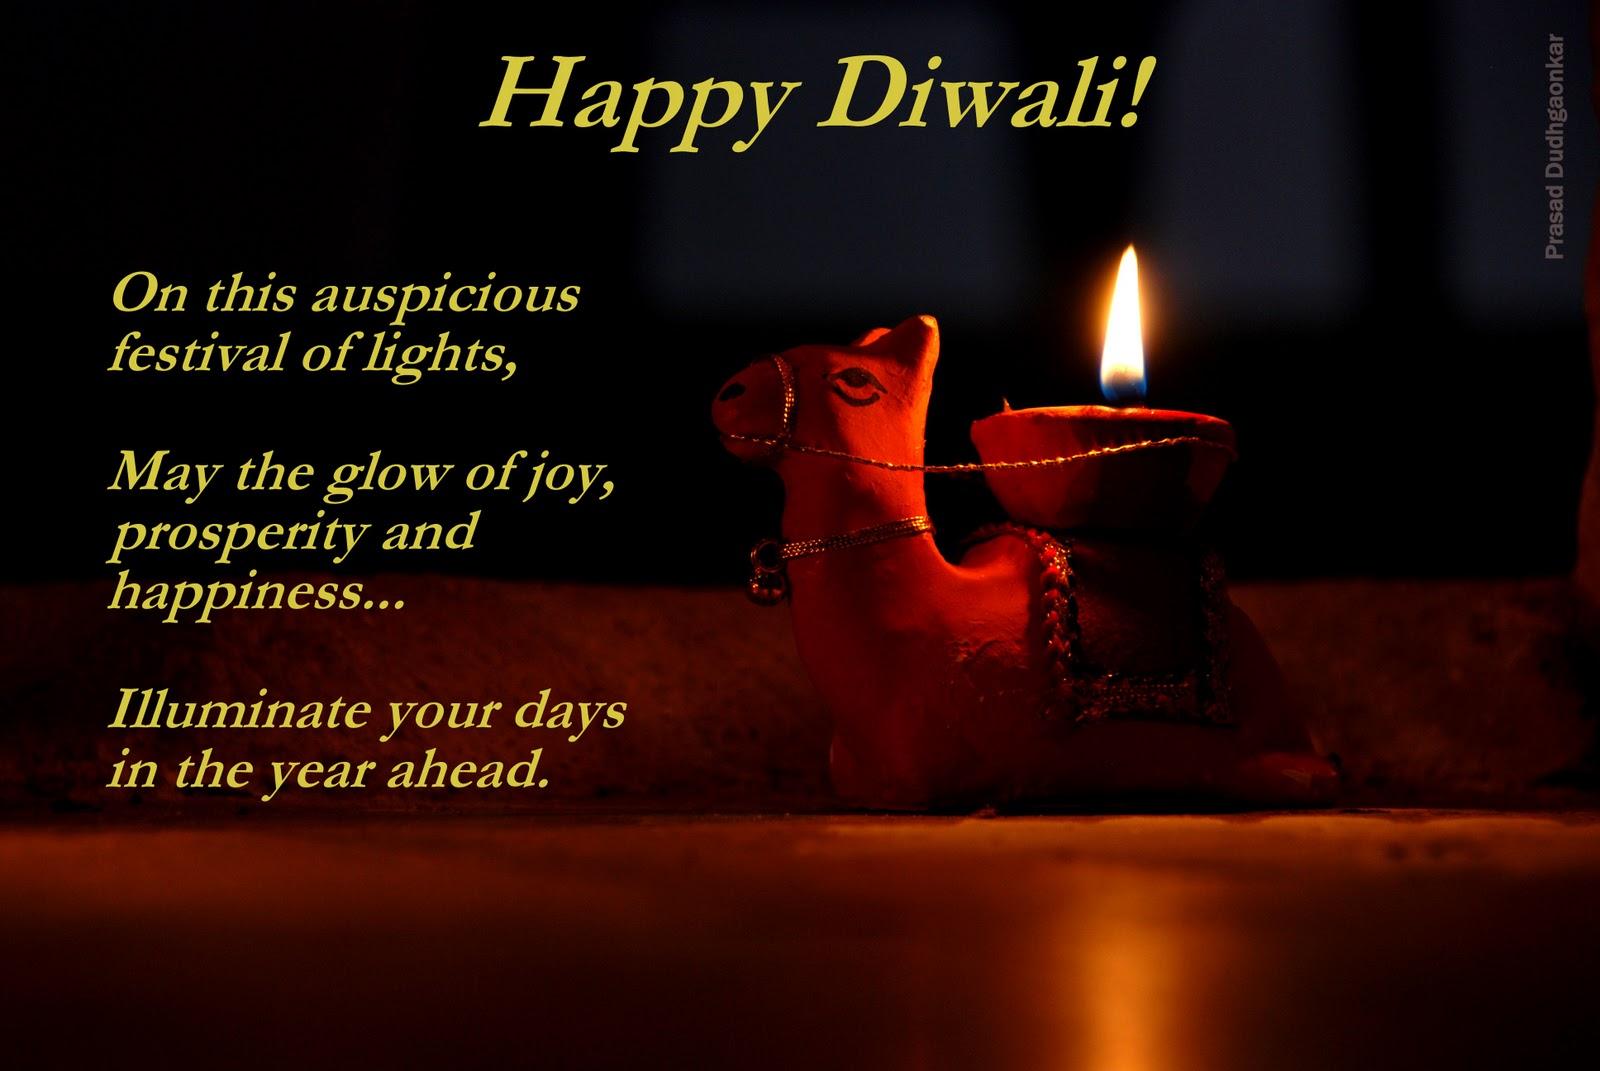 40 Happy Diwali Wishes Images 2018 Happy Diwali 2018